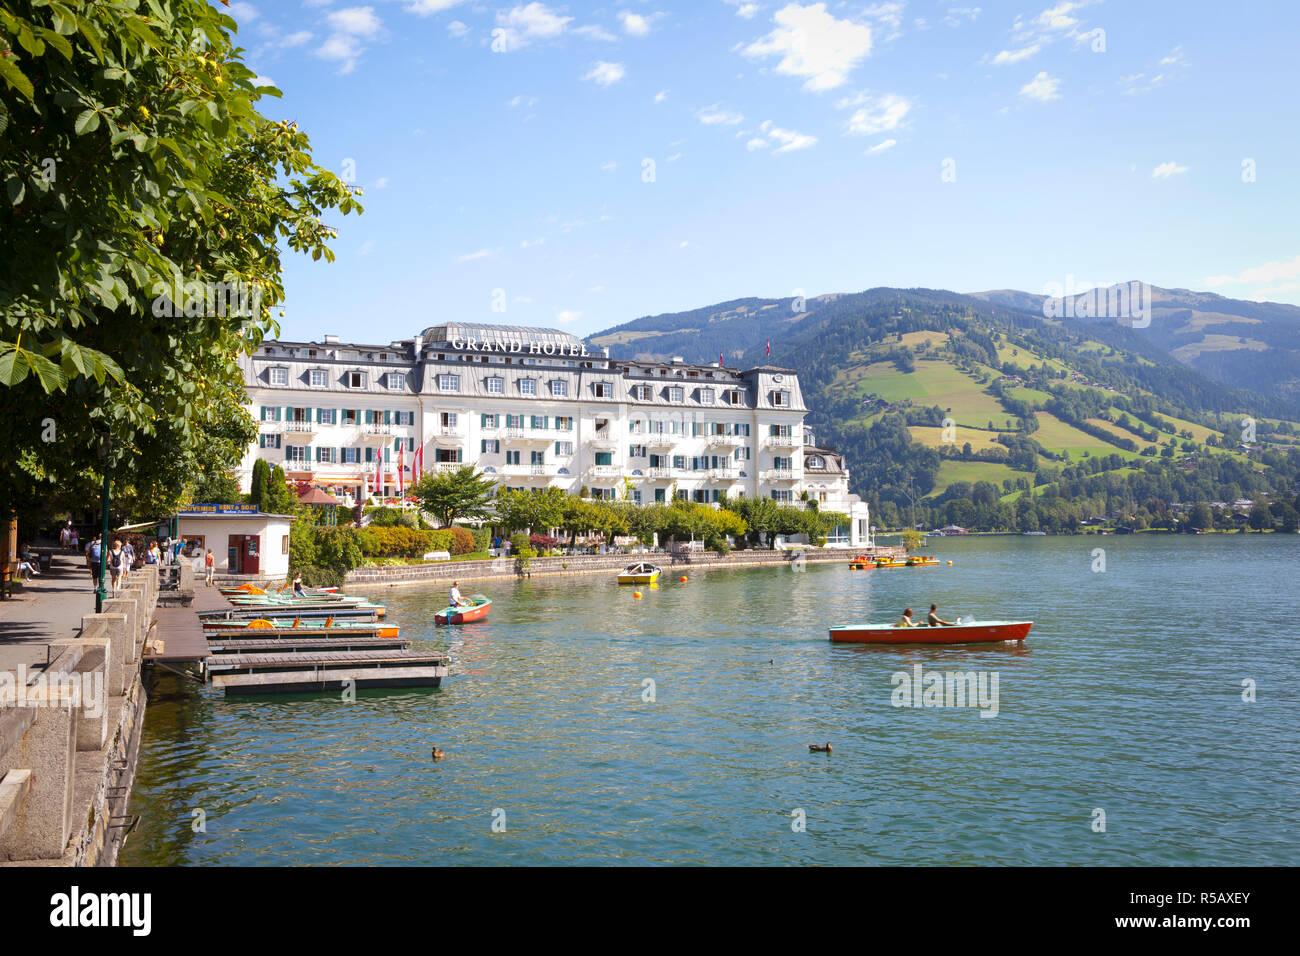 Grand Hotel on Lake Zell am See, Pinzgau, Salzkammergut, Austria Stock Photo